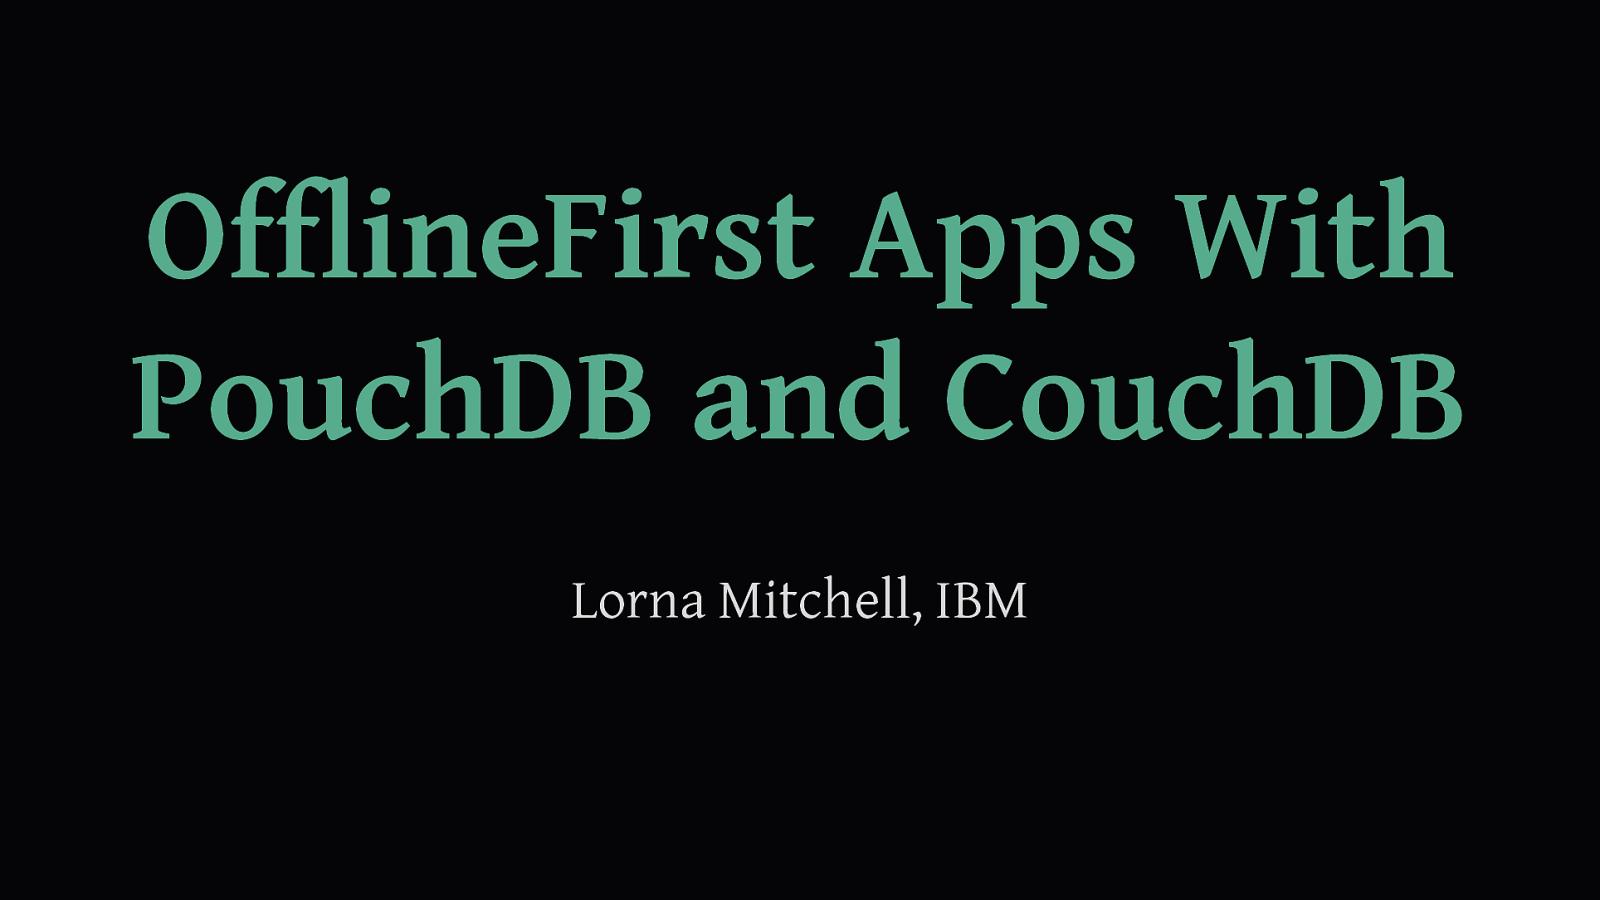 Offline First Apps with PouchDB andCouchDB